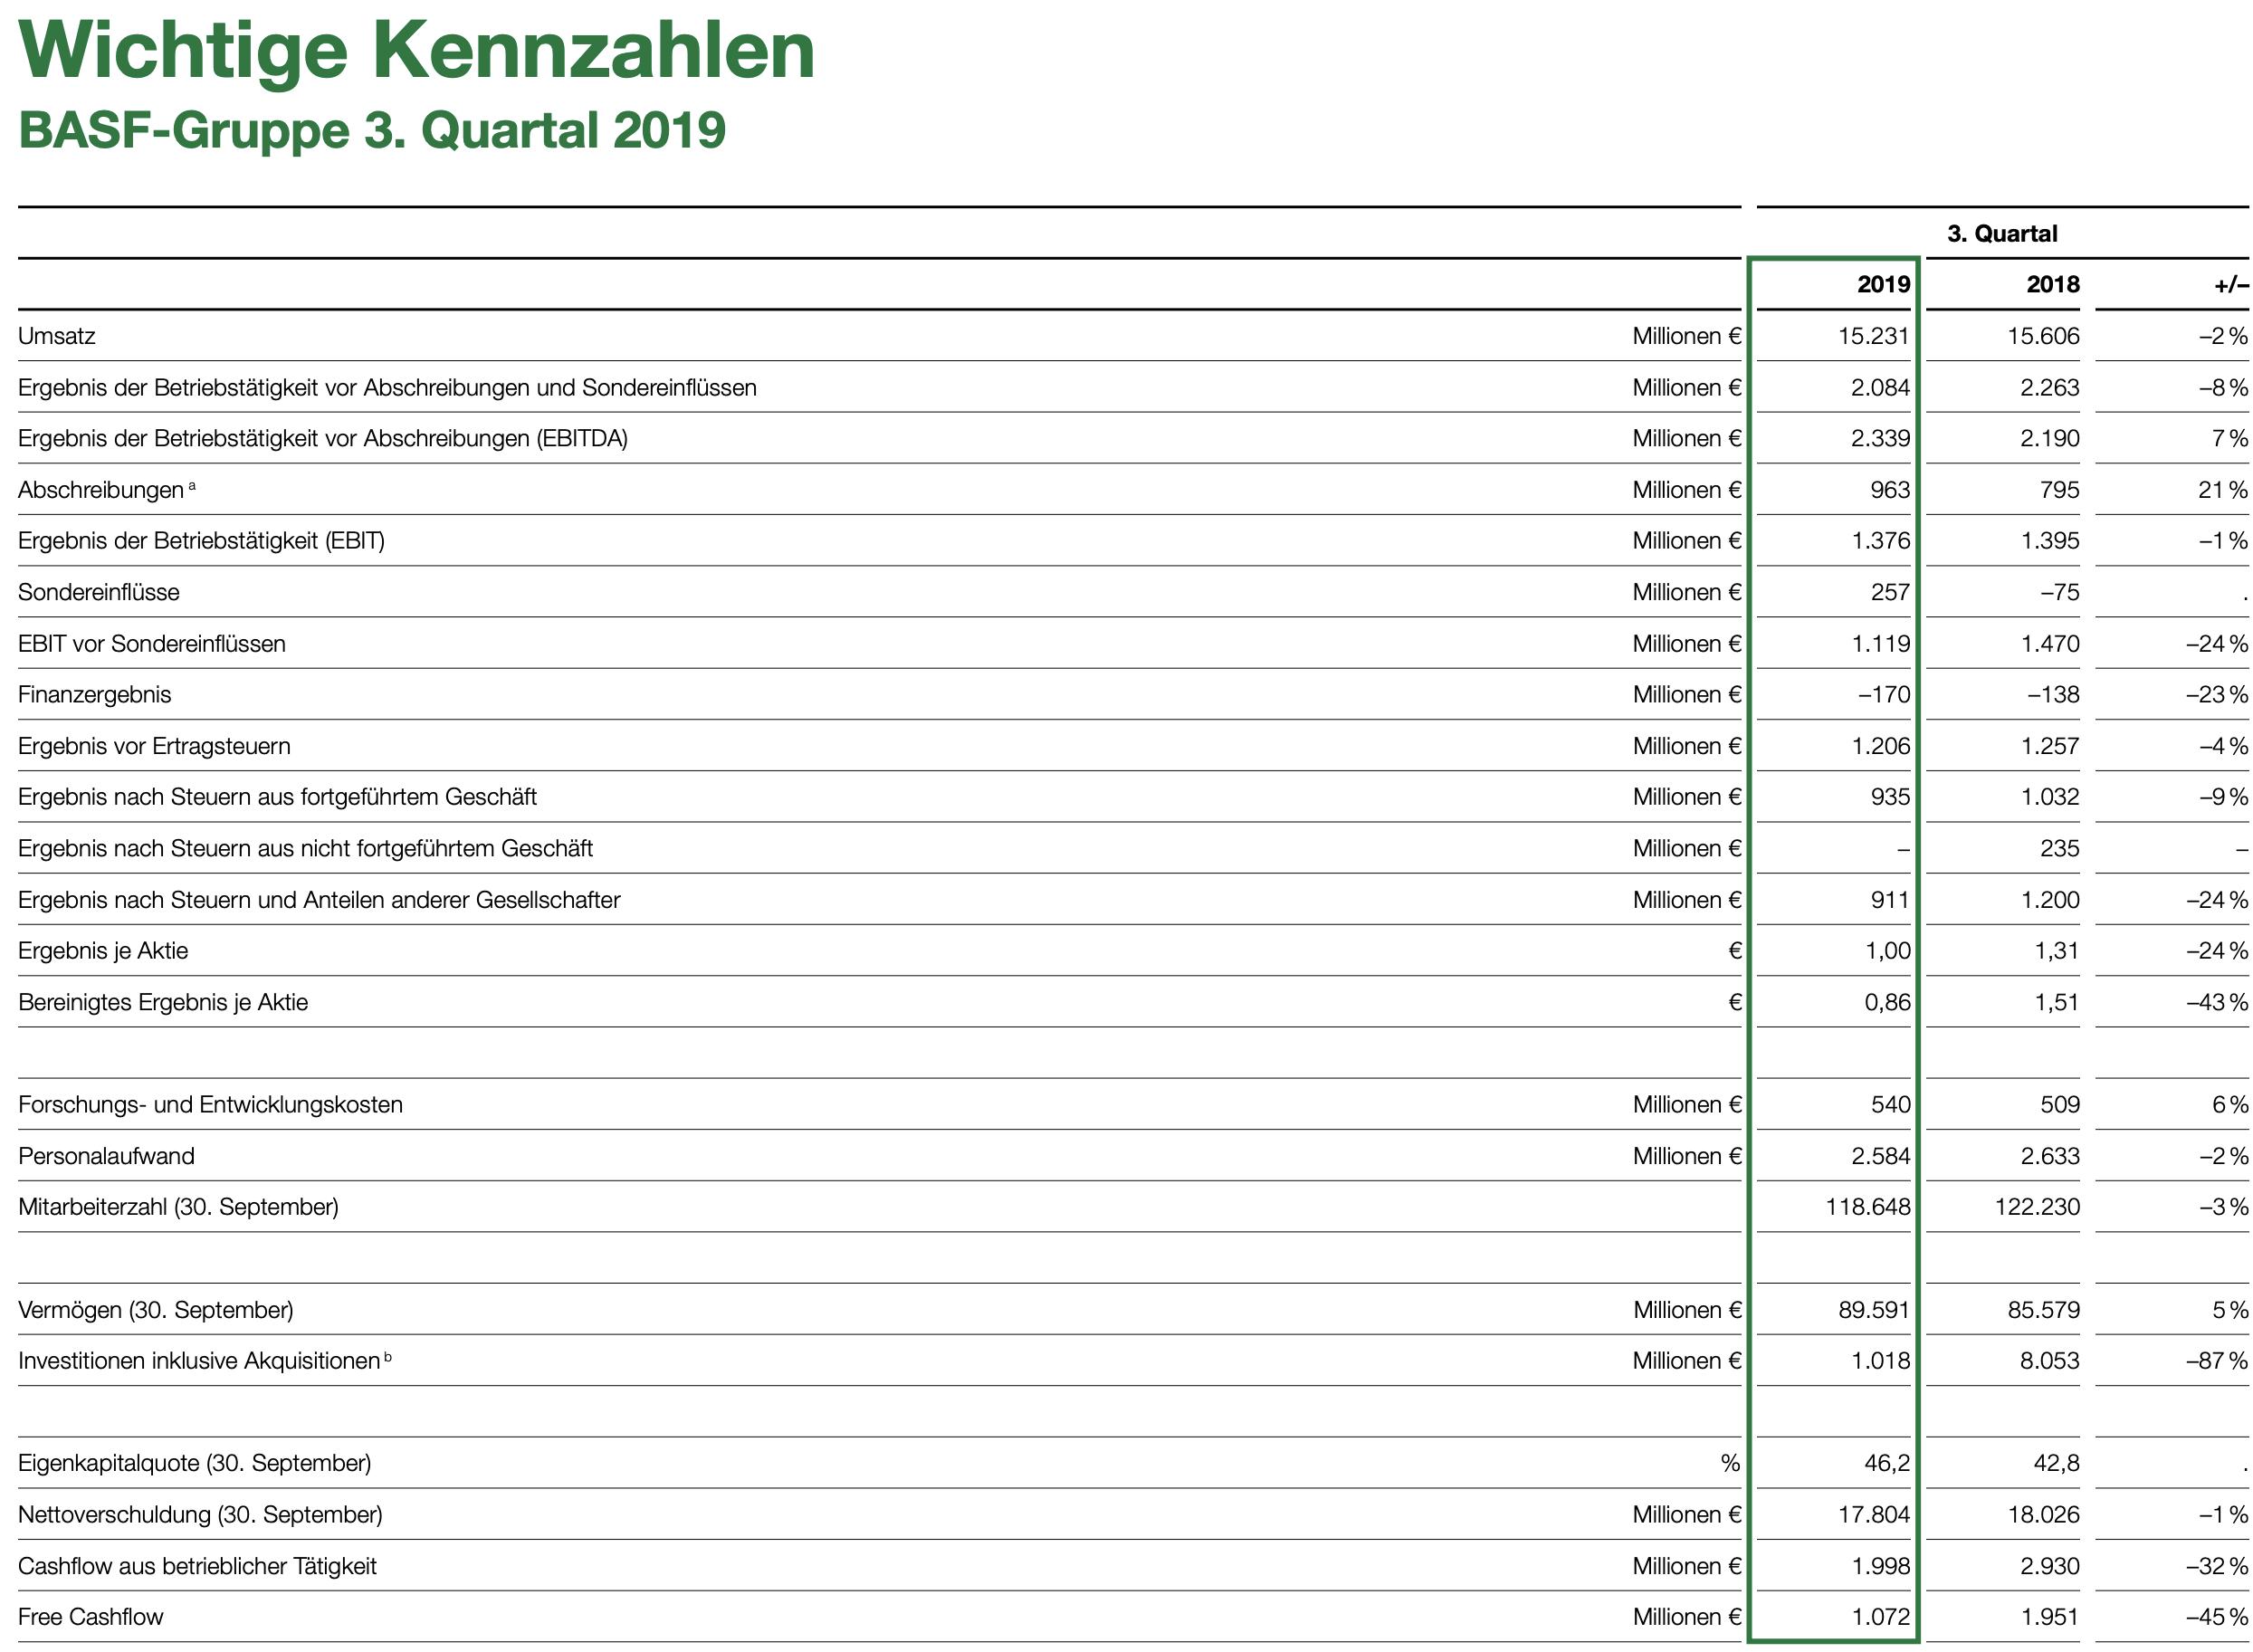 BASF-Quartalszahlen Tabelle